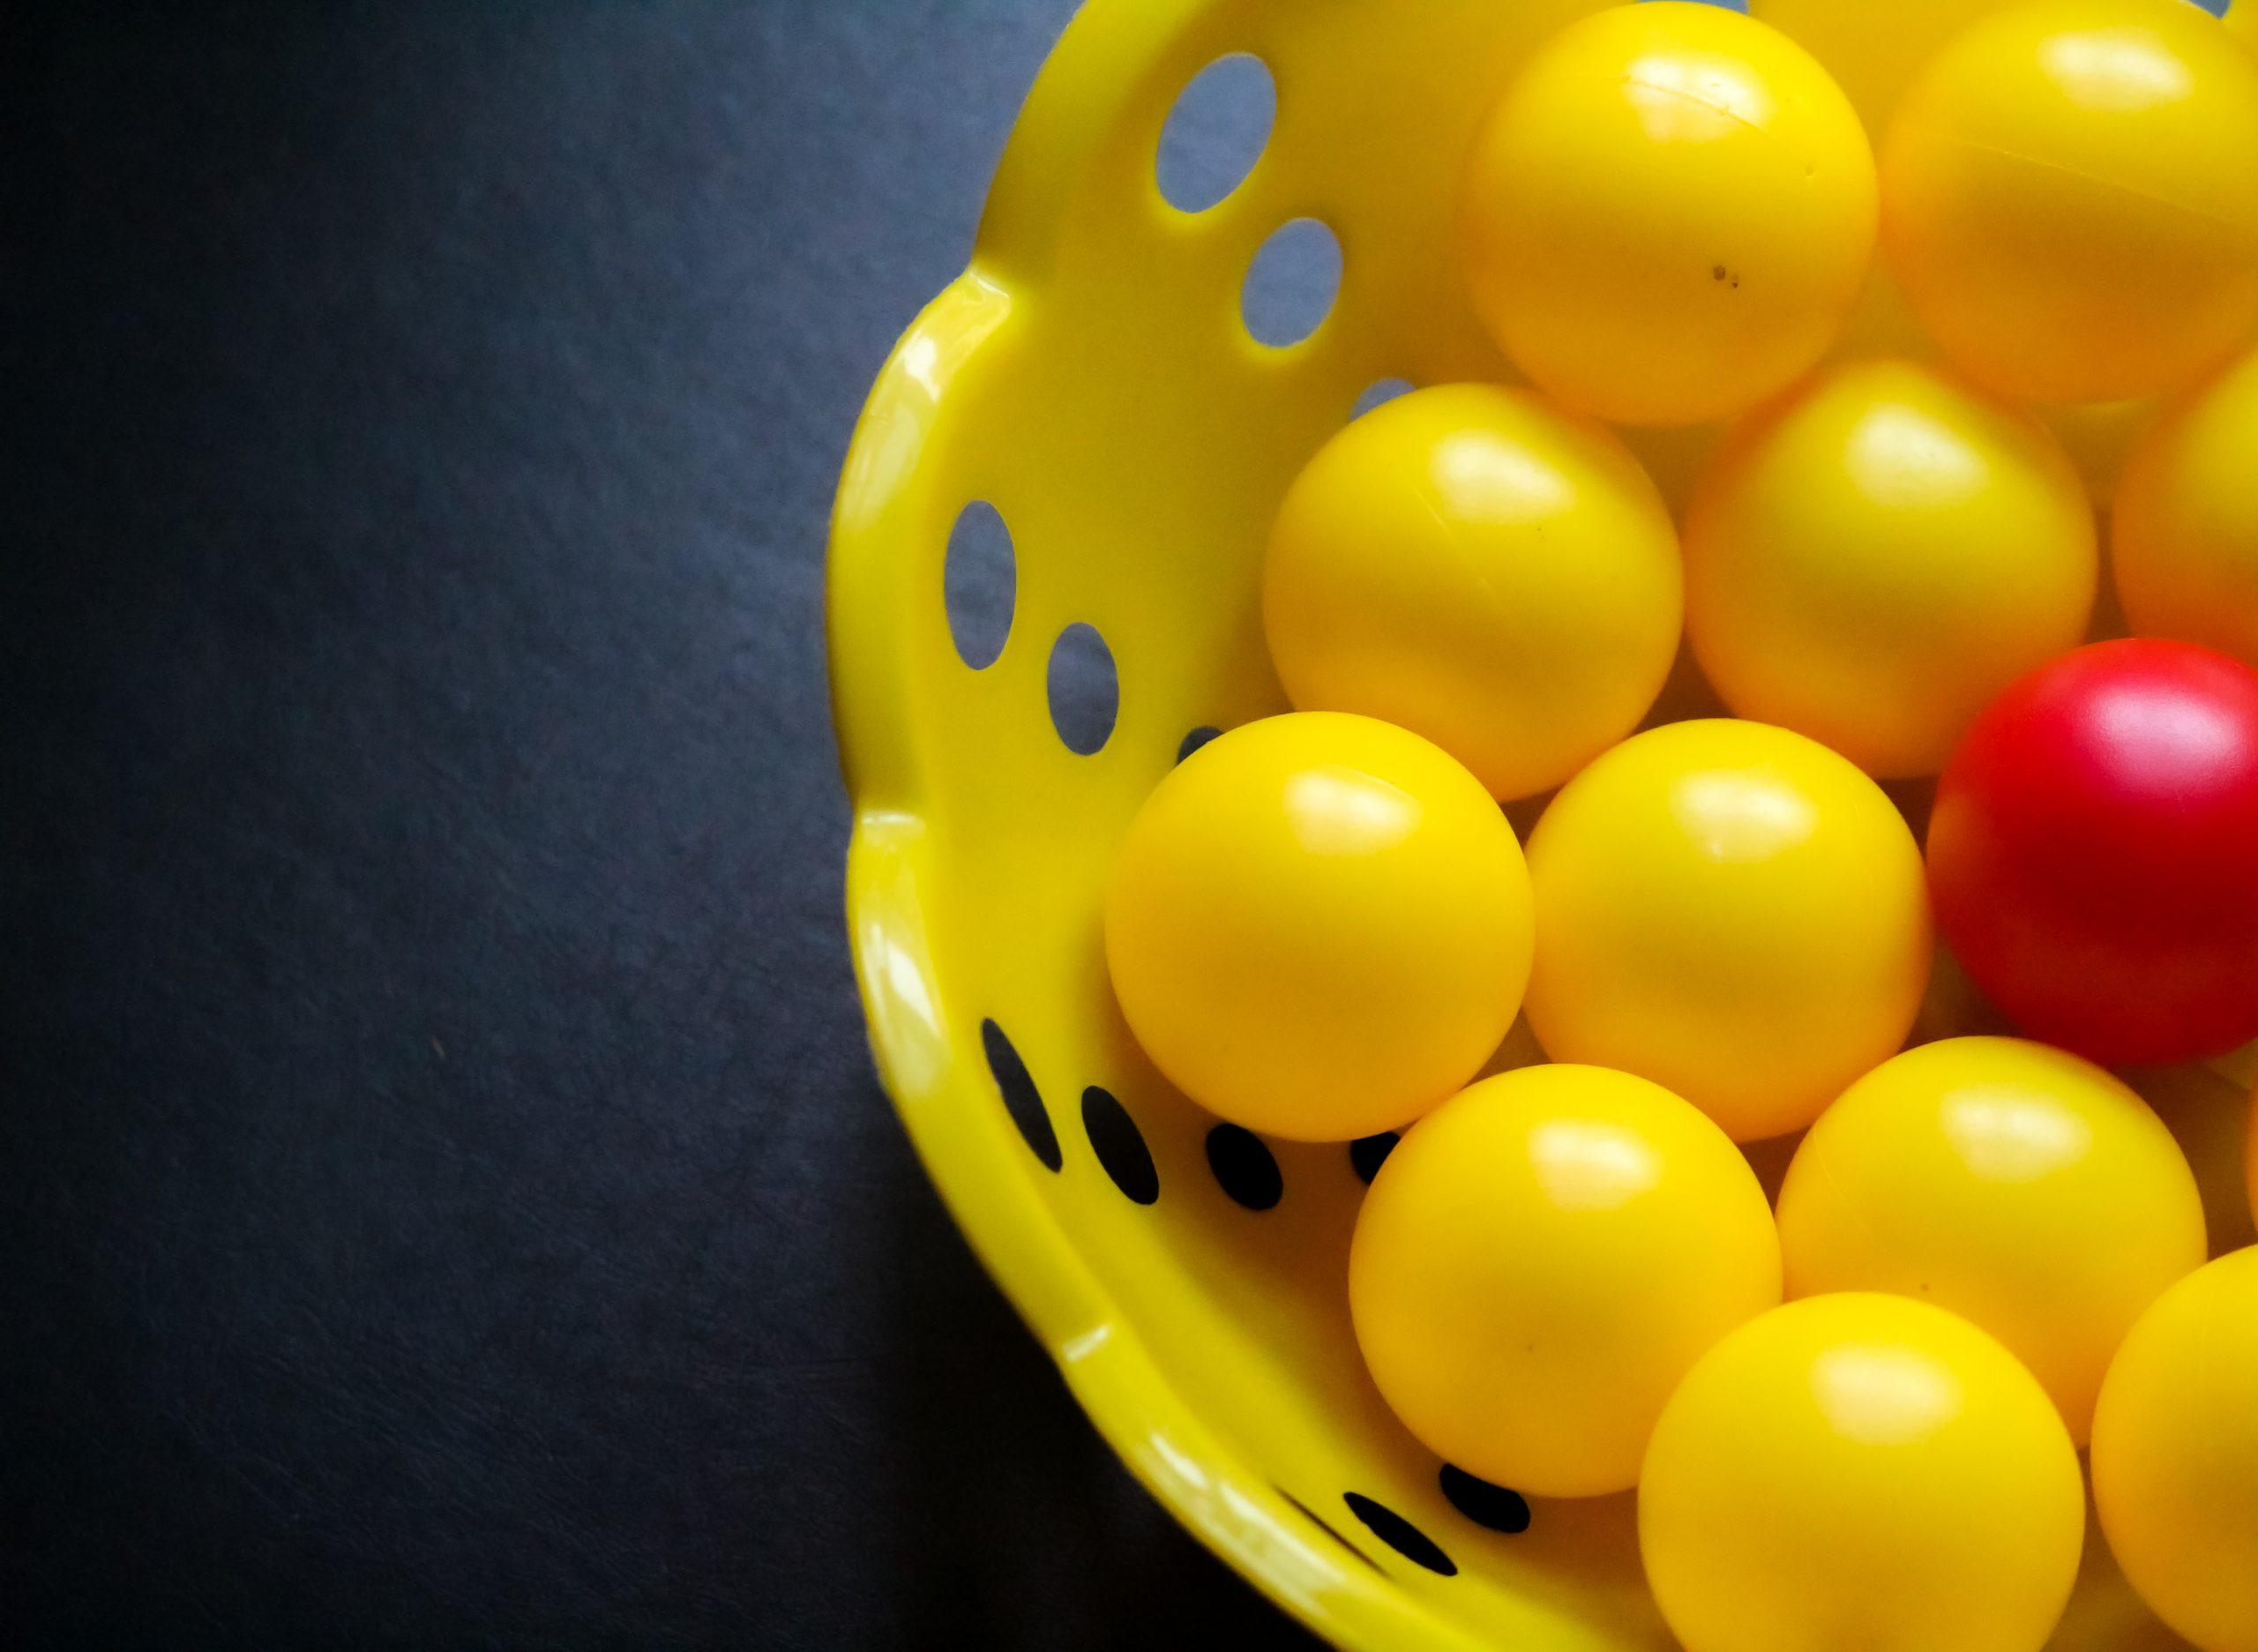 Balls arranged in basket